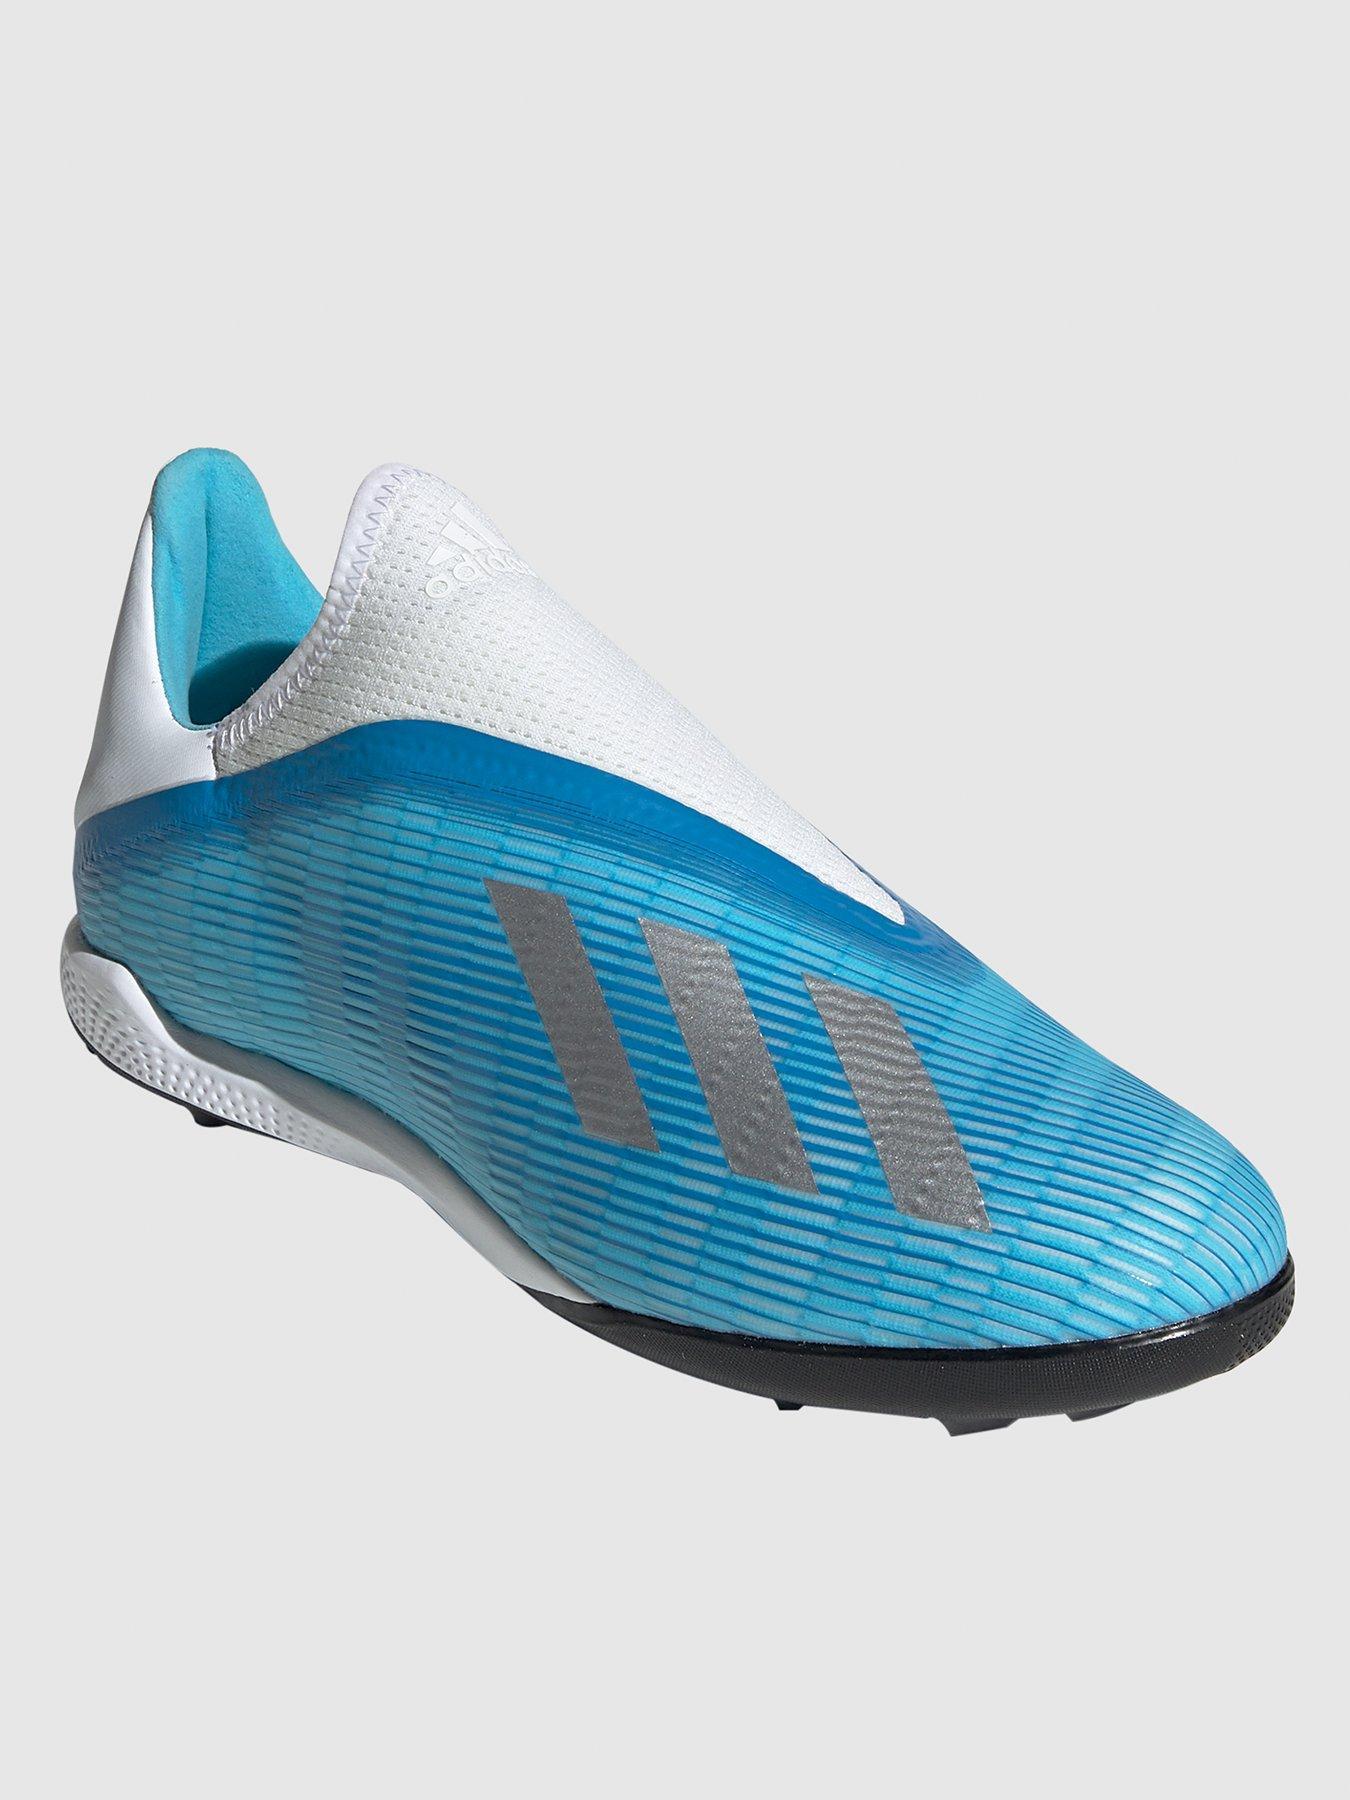 Laceless 19.3 Astro Turf Football Boot